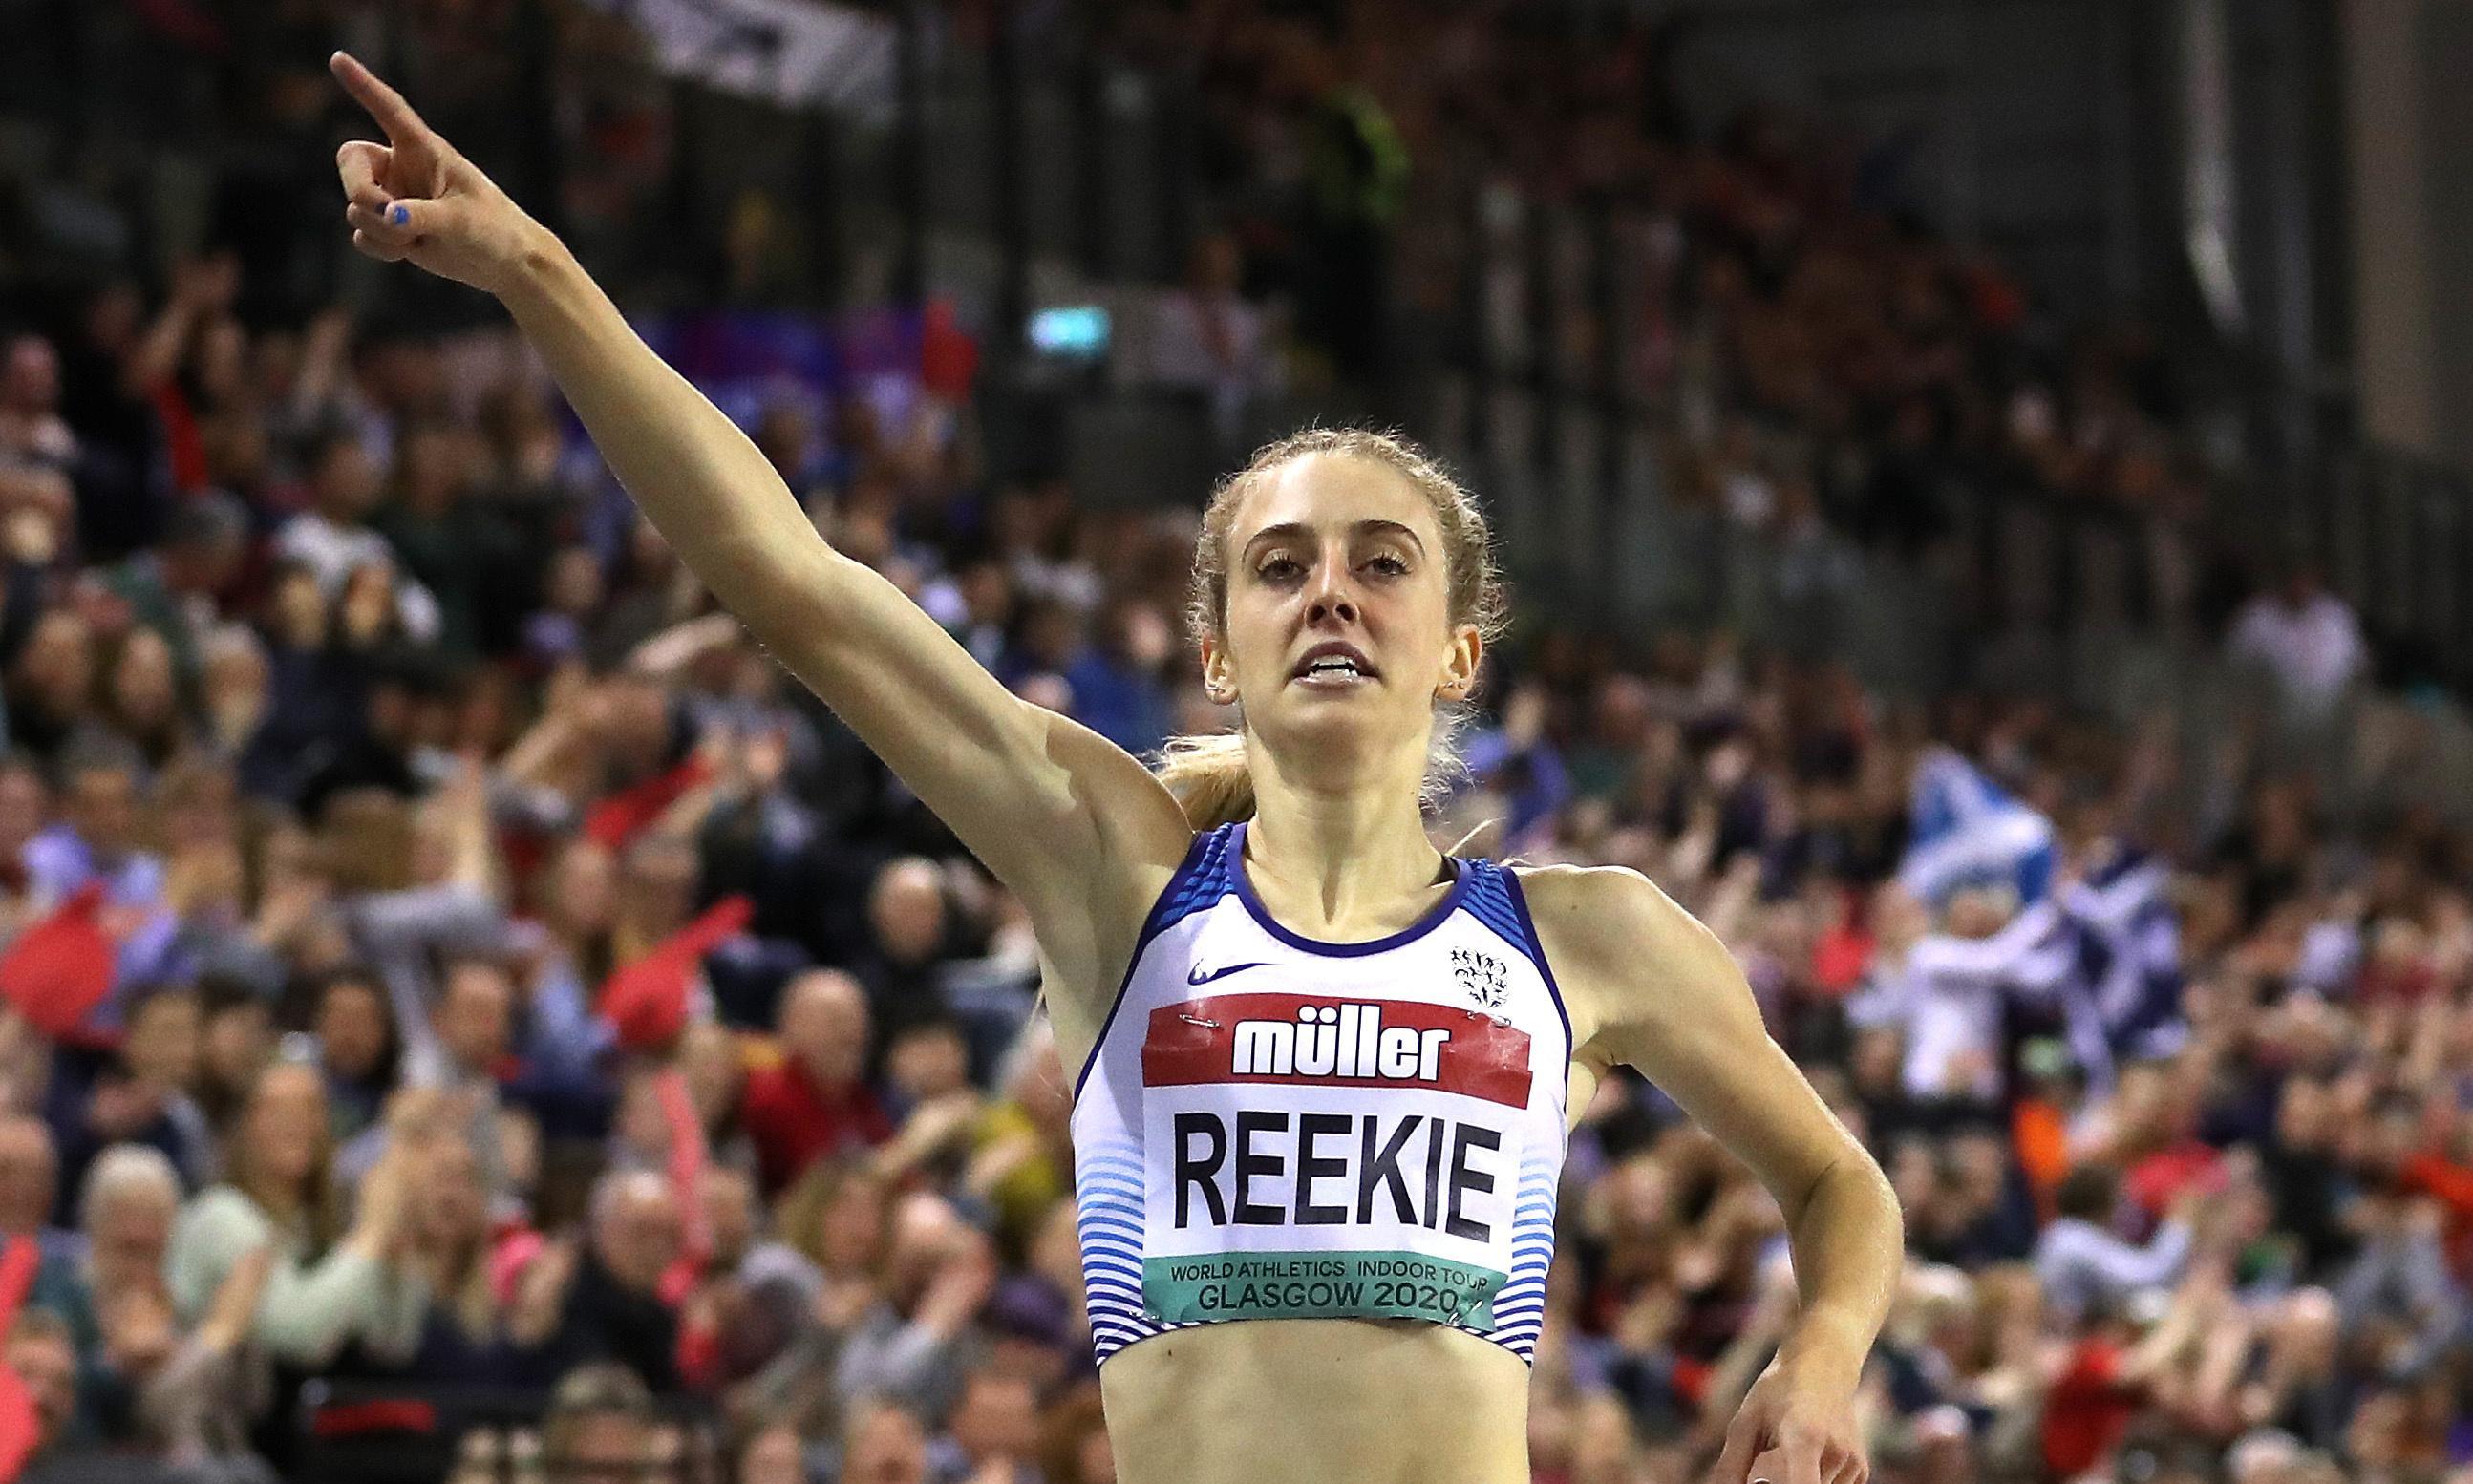 Jemma Reekie takes biggest scalp yet as she beats 800m world champion